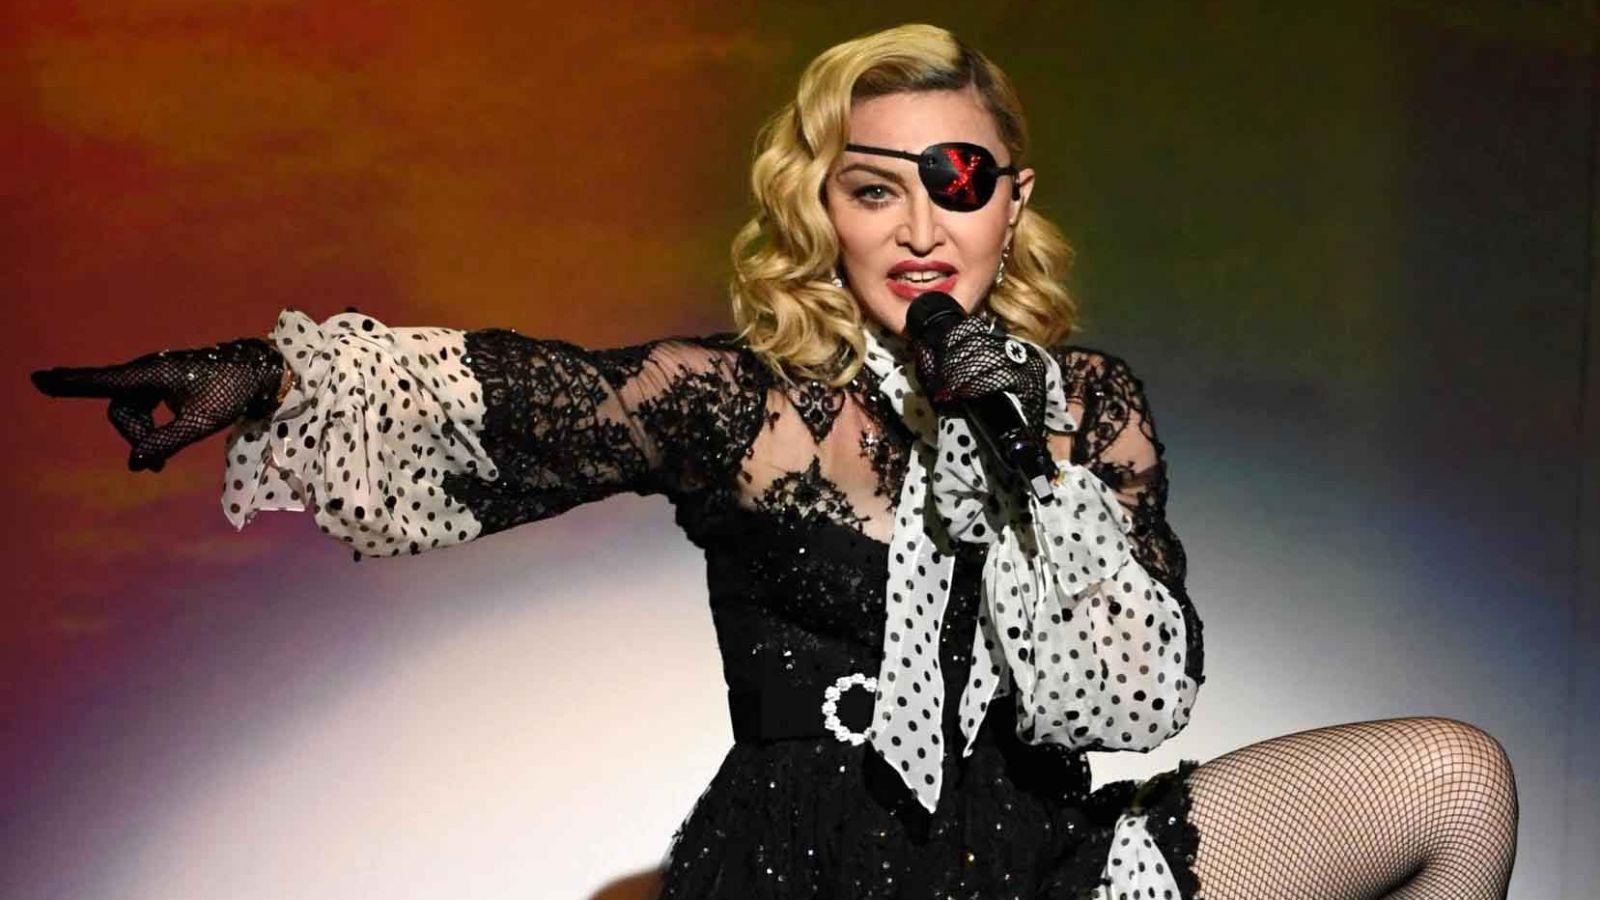 Madonna: Έρχεται ντοκιμαντέρ στο Netflix με θέμα τη ζωή της βασίλισσας της pop [vids]